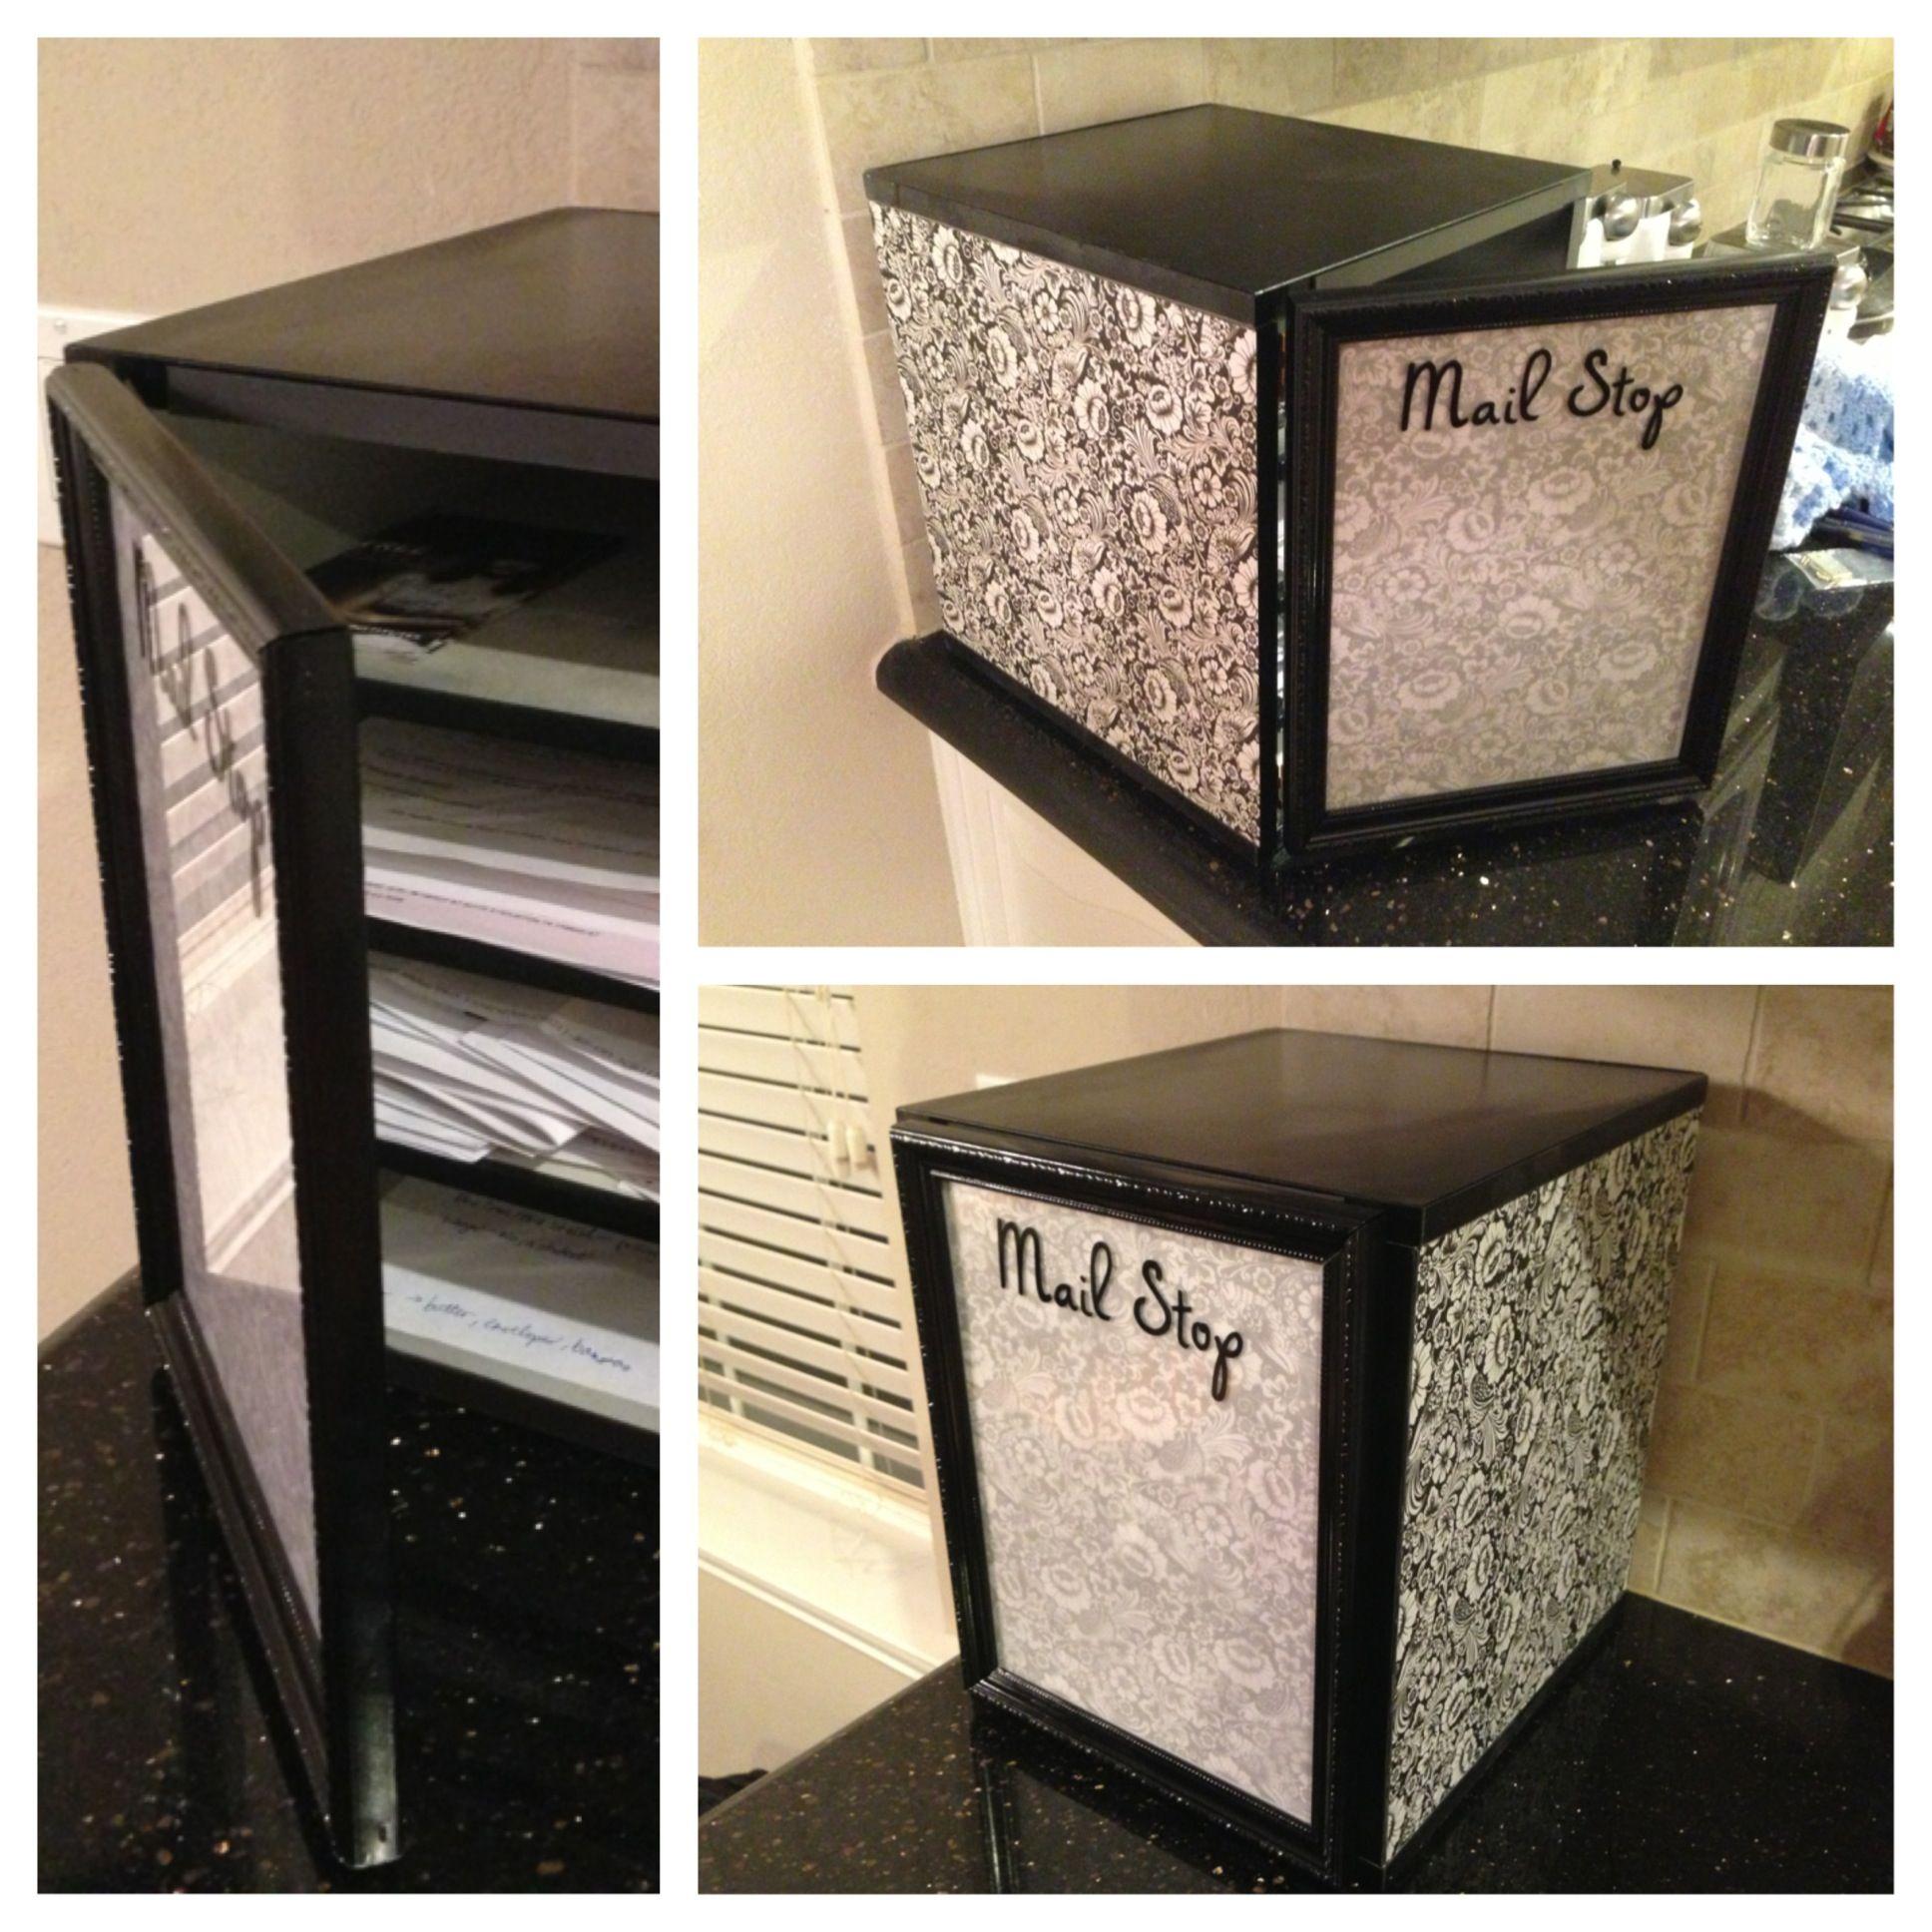 DIY Mail organizer/bill sorter/dry erase board. Spray